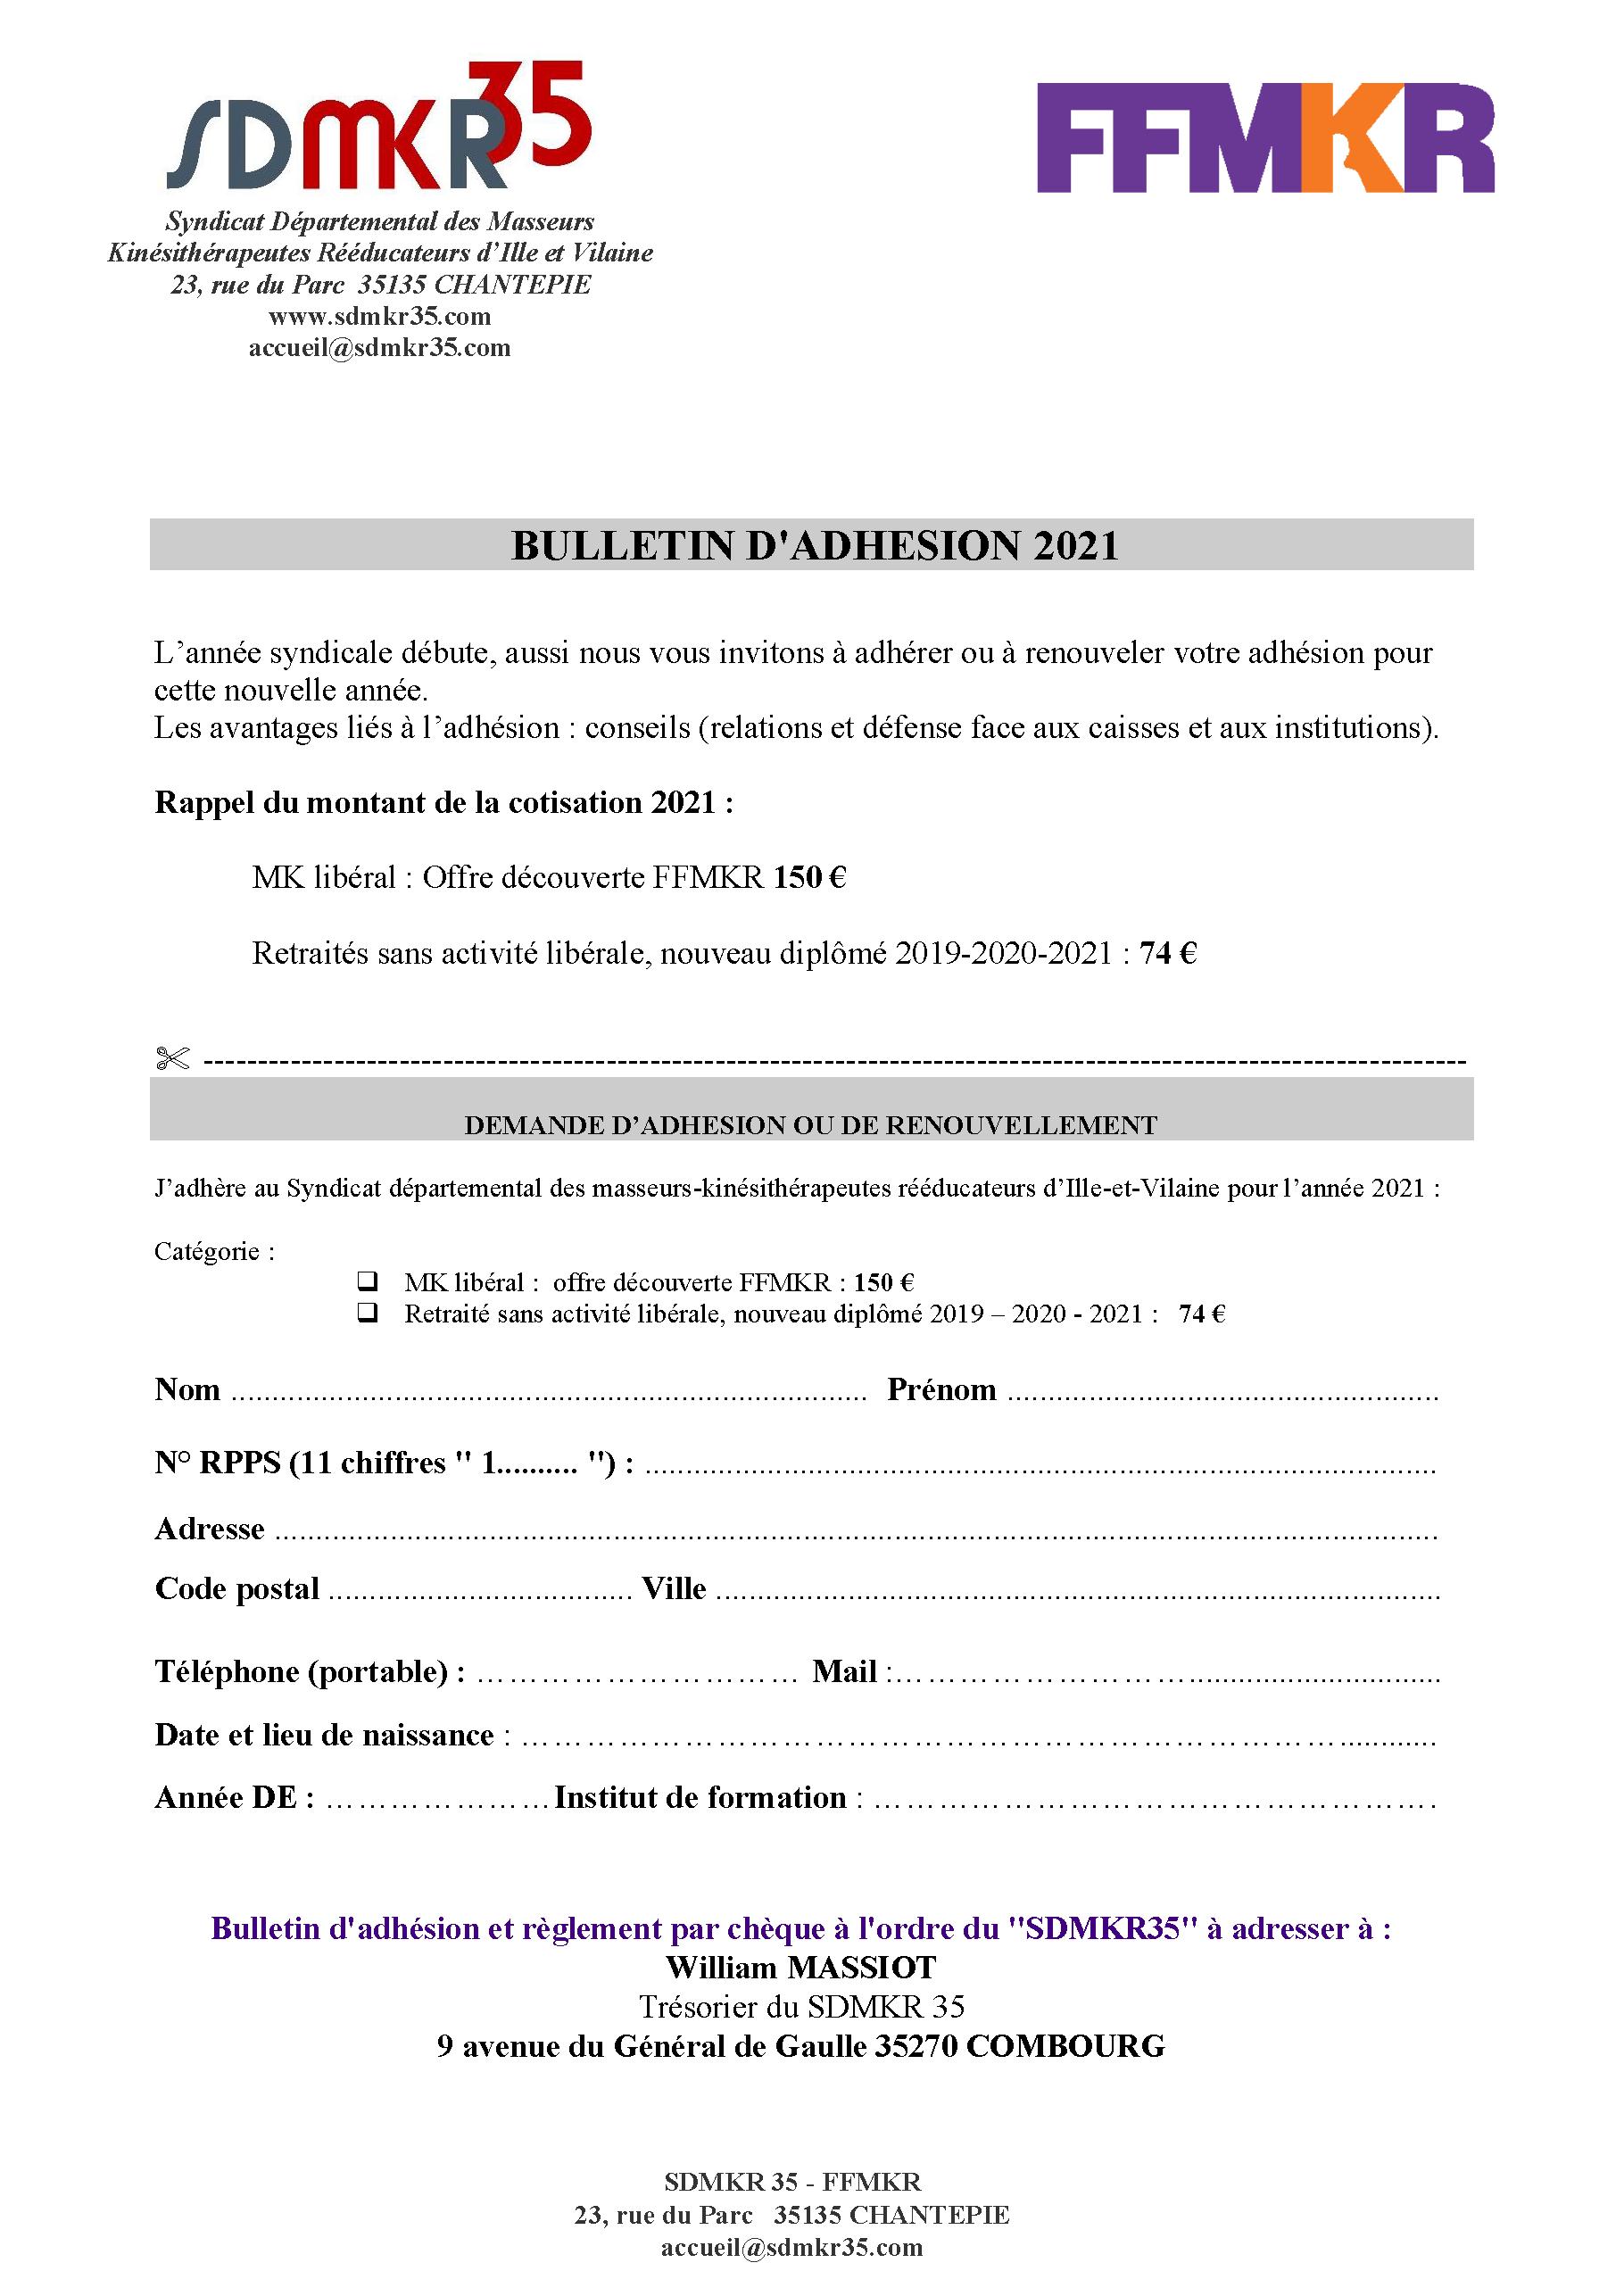 Bulletin d'adhésion SDMKR 35-FFMKR 2021